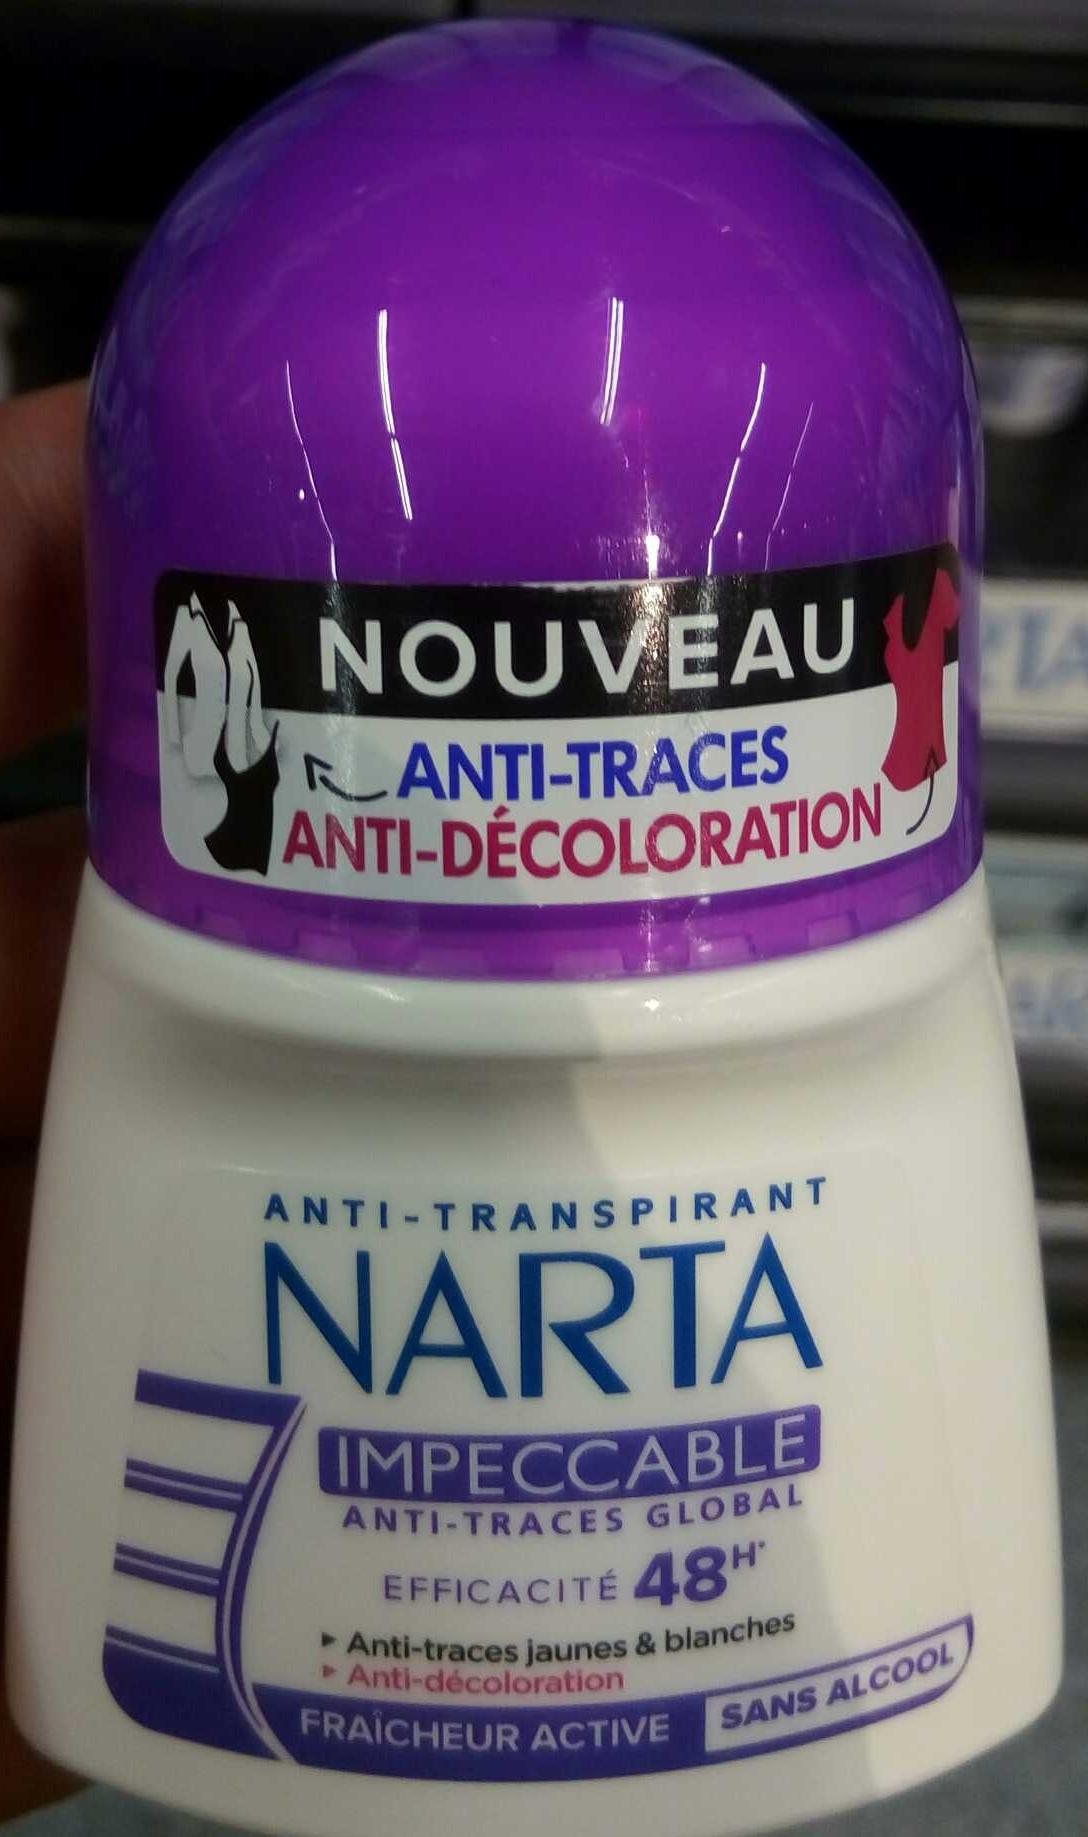 Anti-transpirant Impeccable 48H - Produit